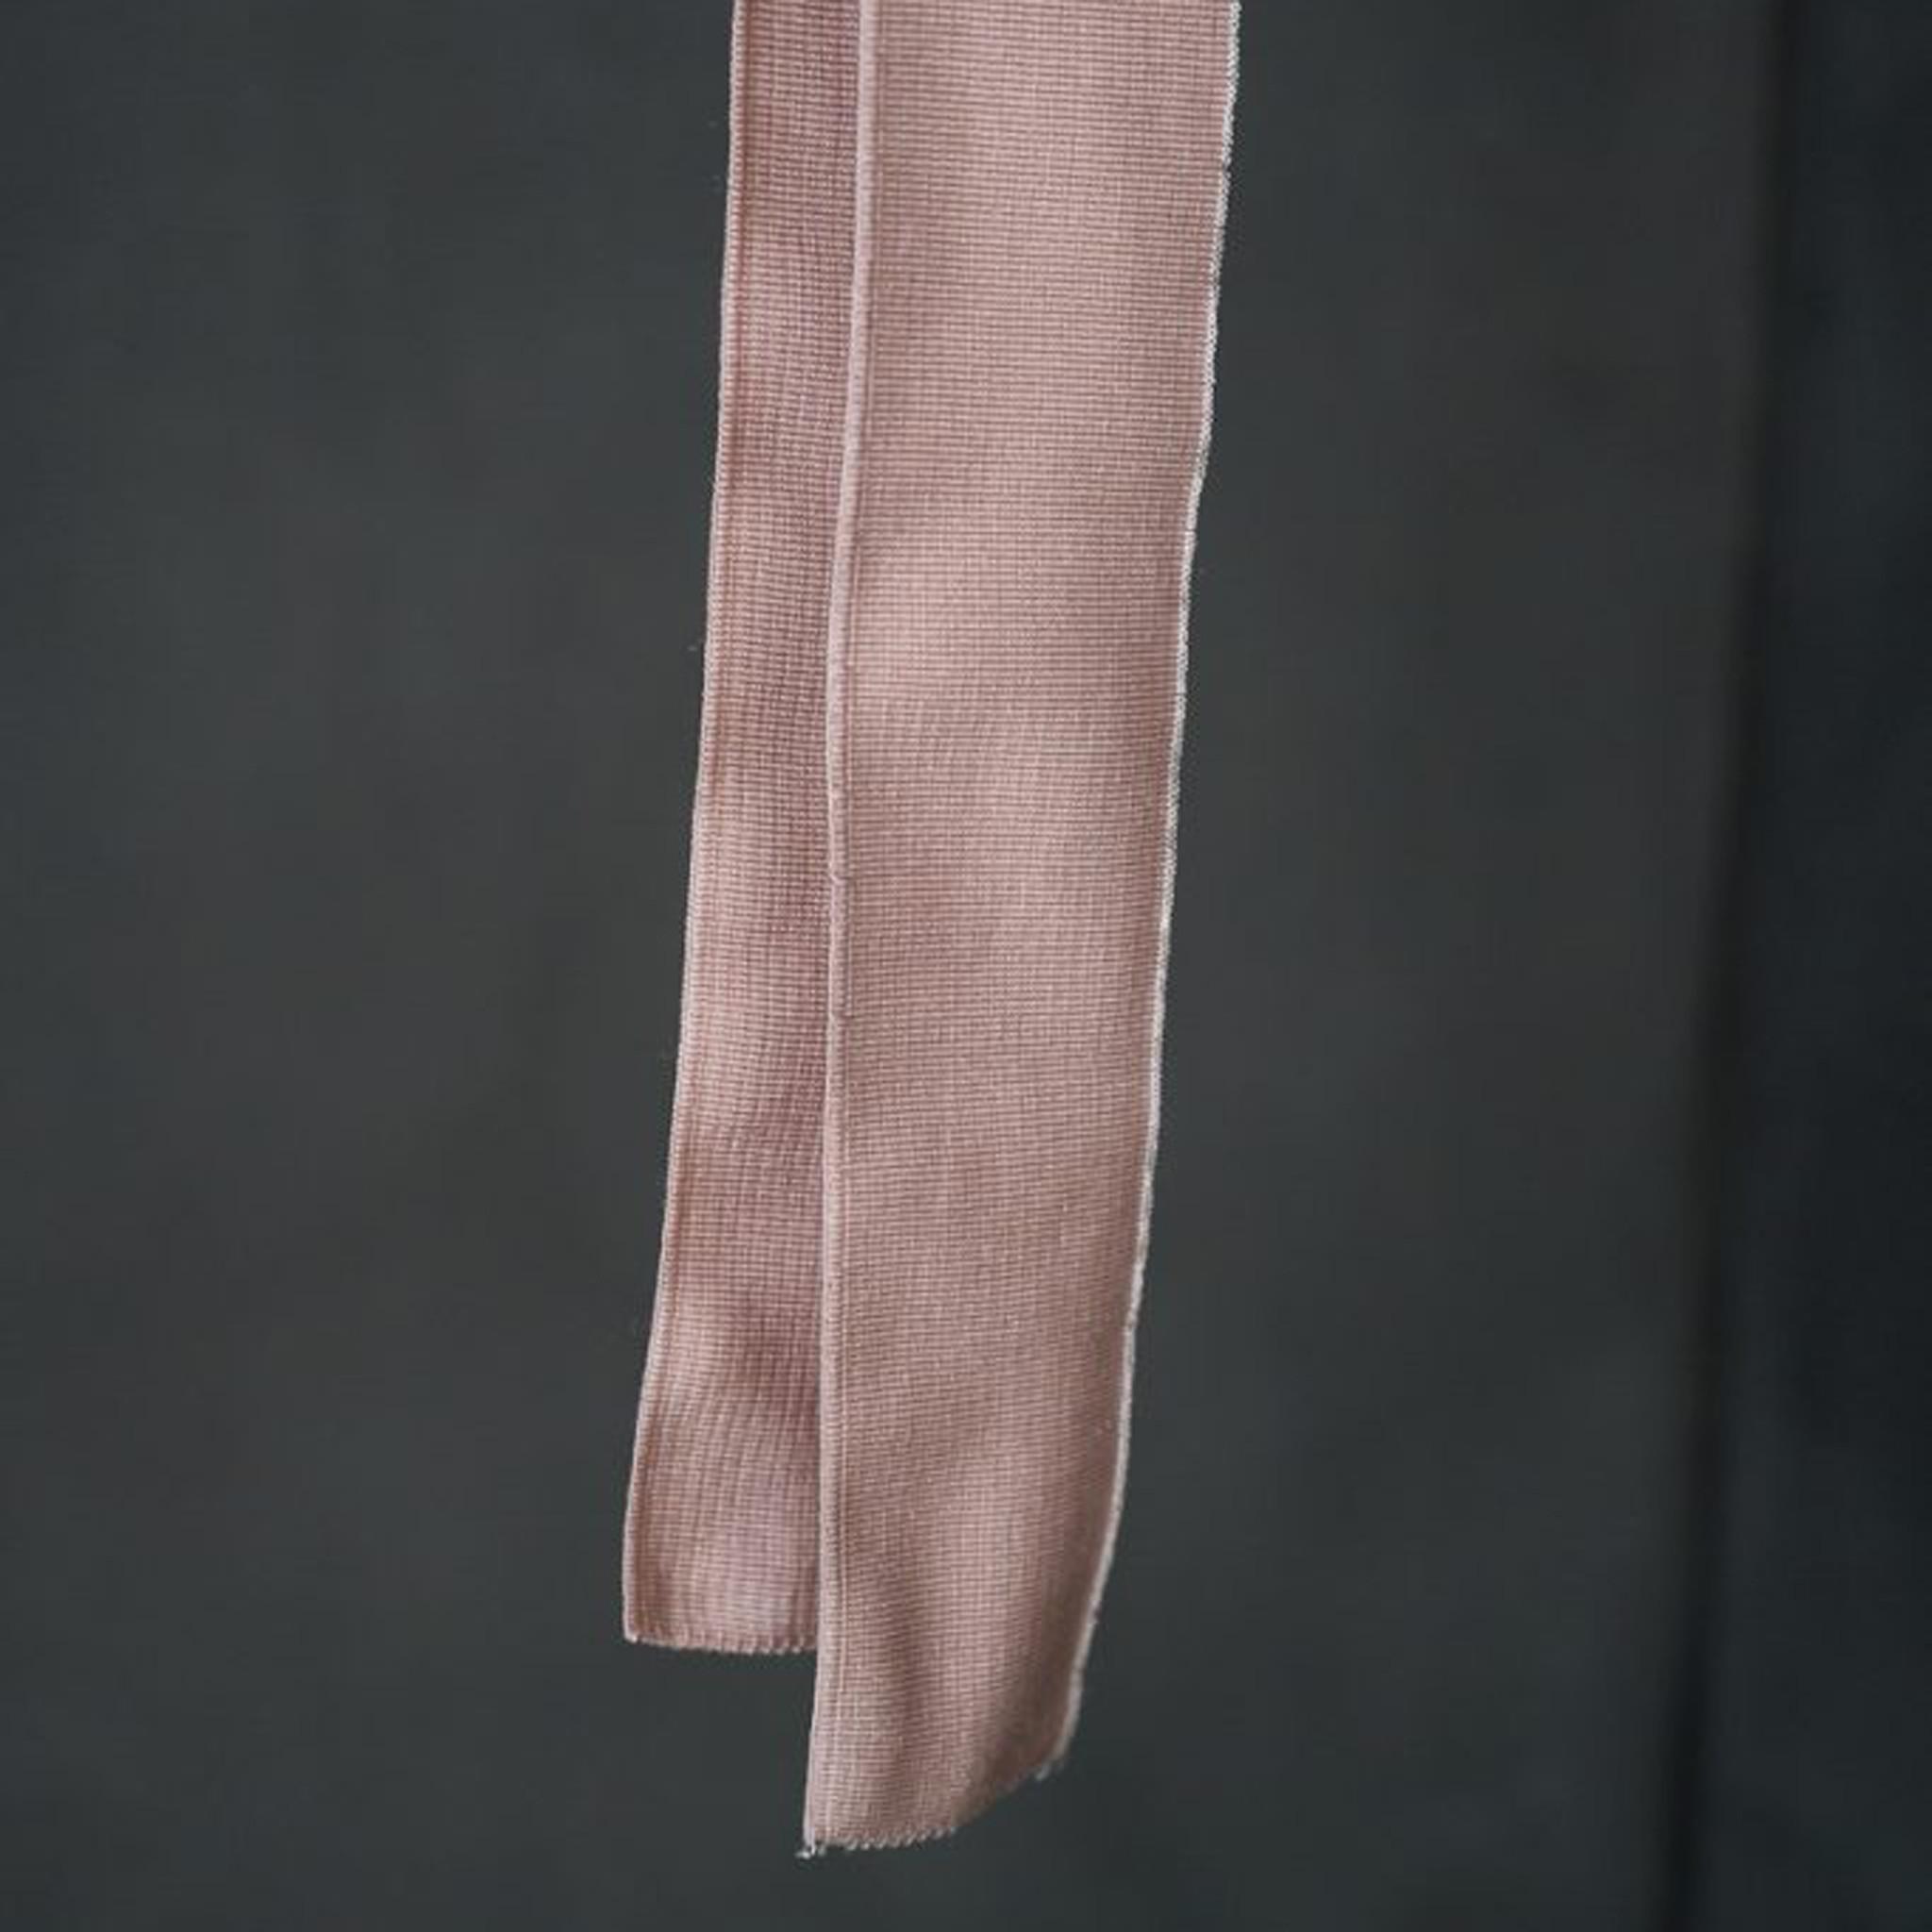 Merchant & Mills : Rose Luxe Rib : 1 metre